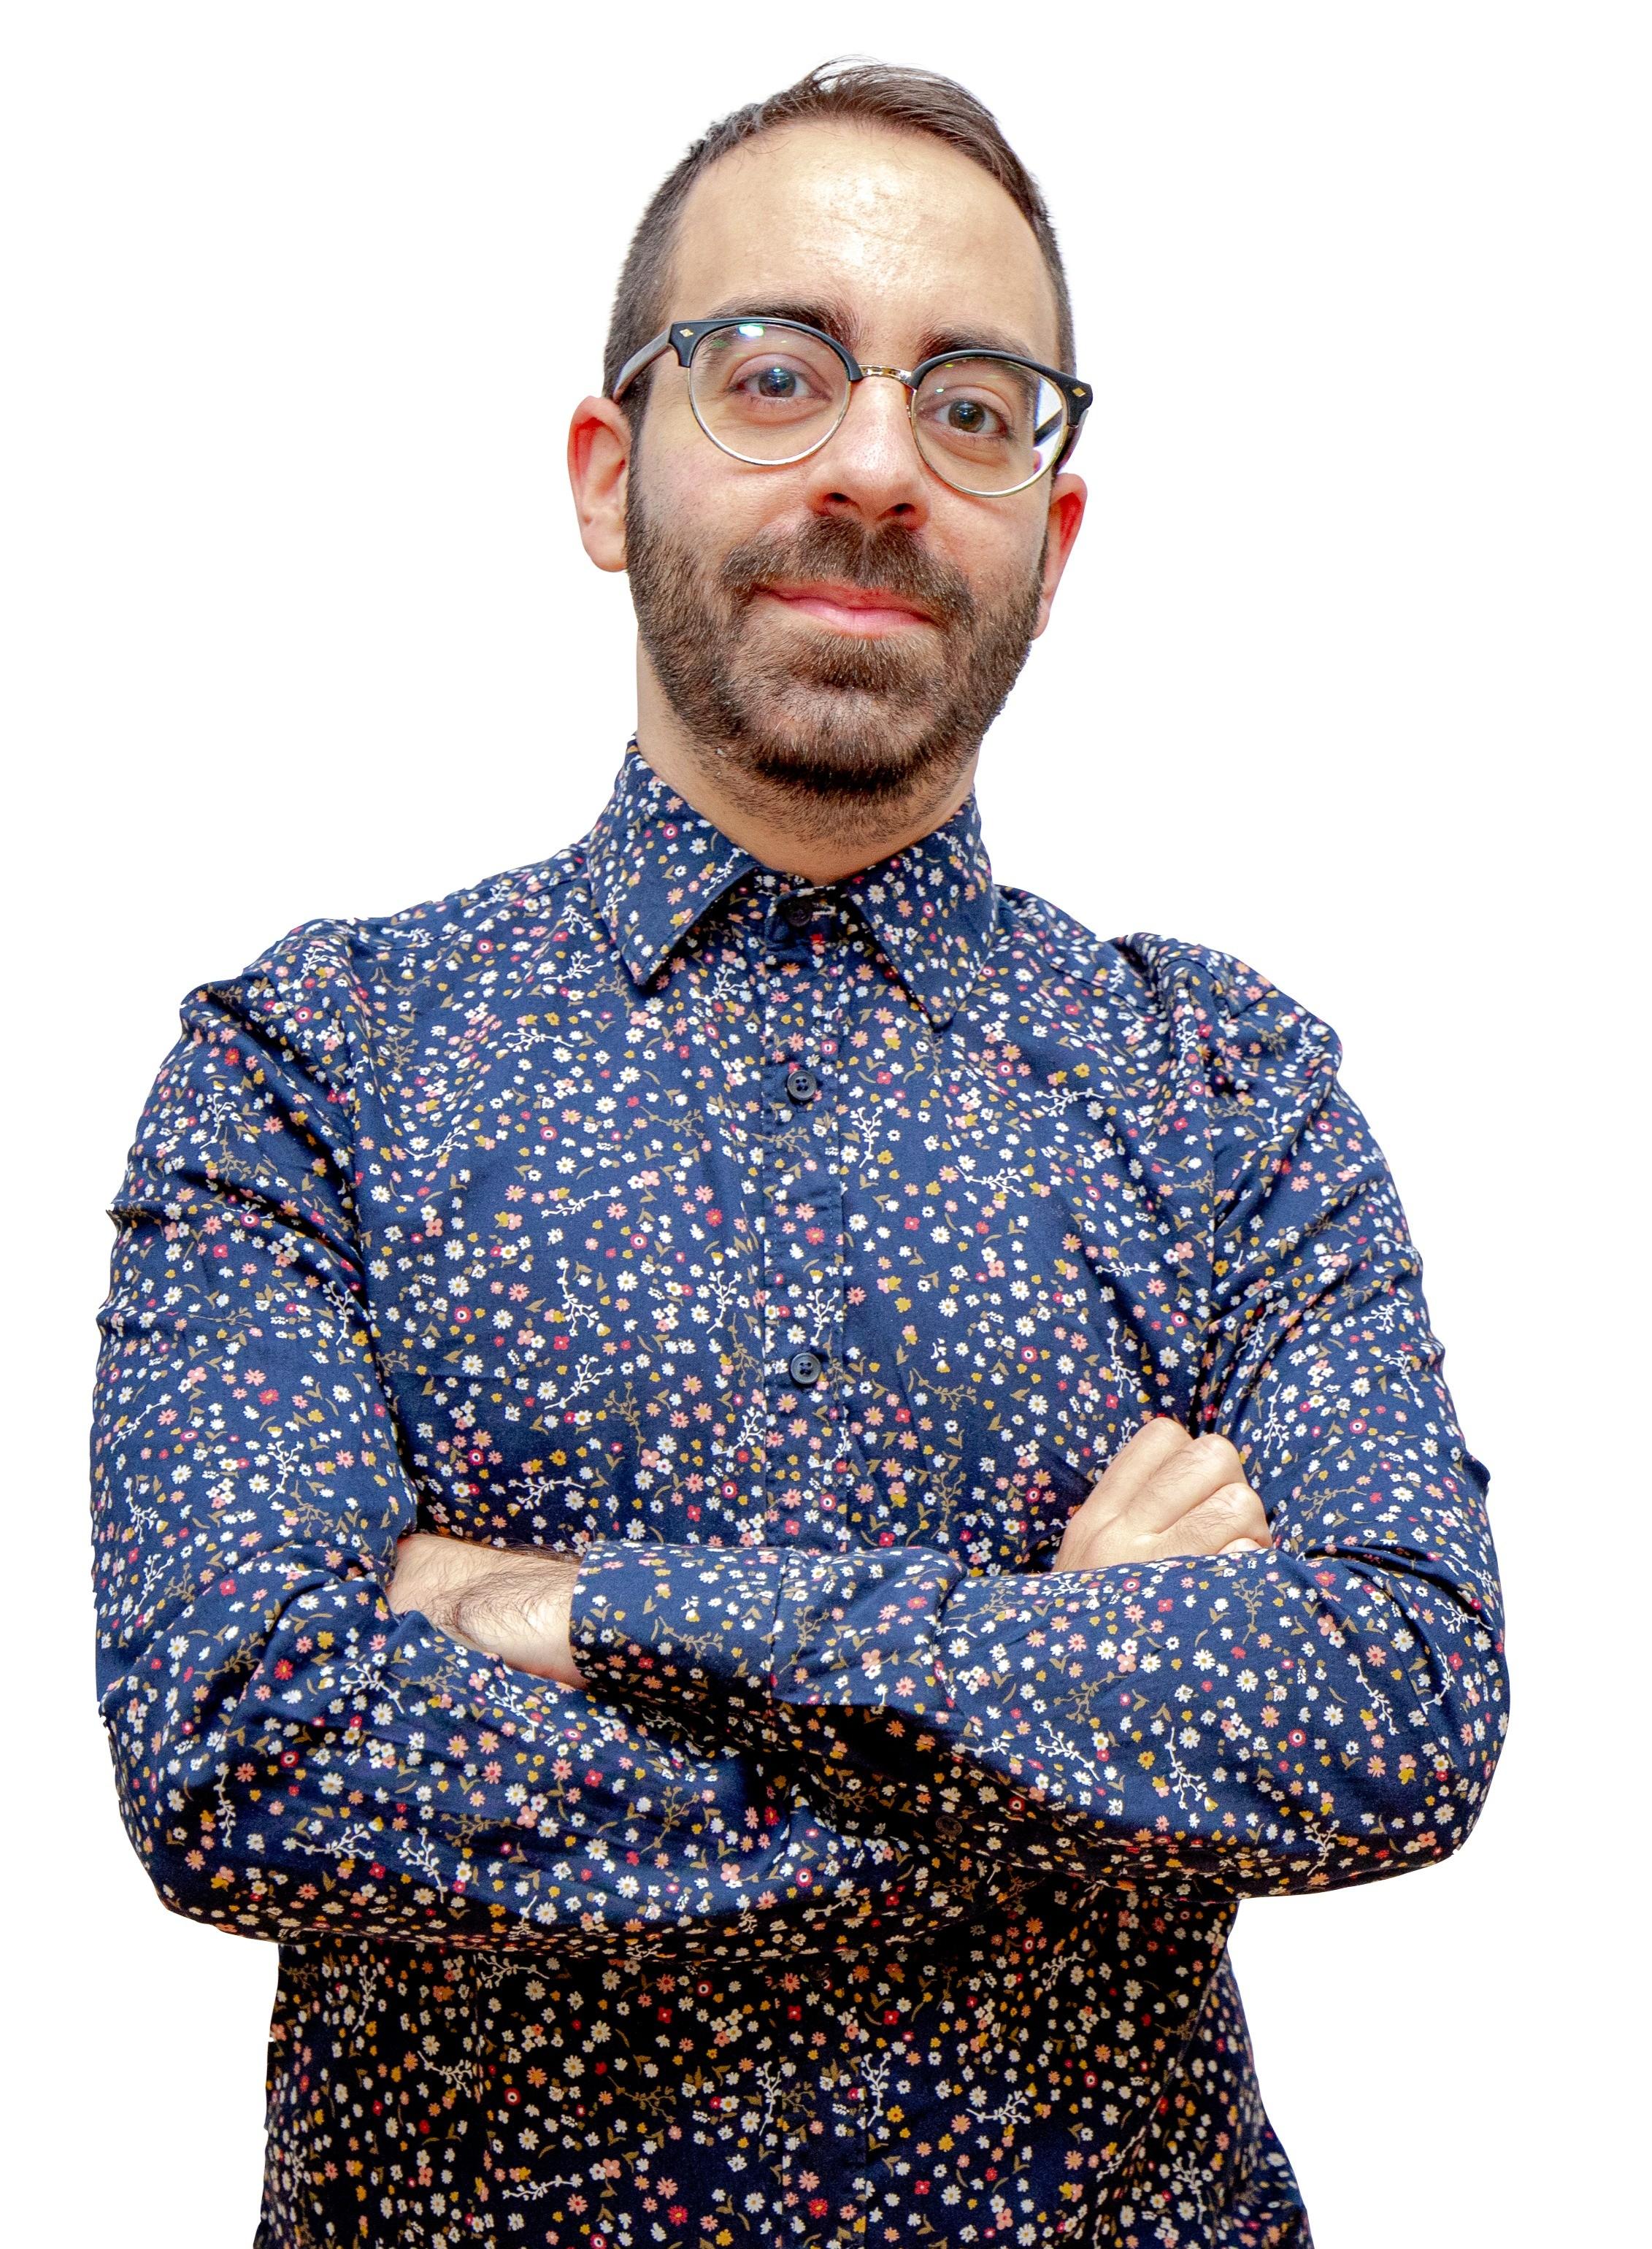 David Brito Panizo